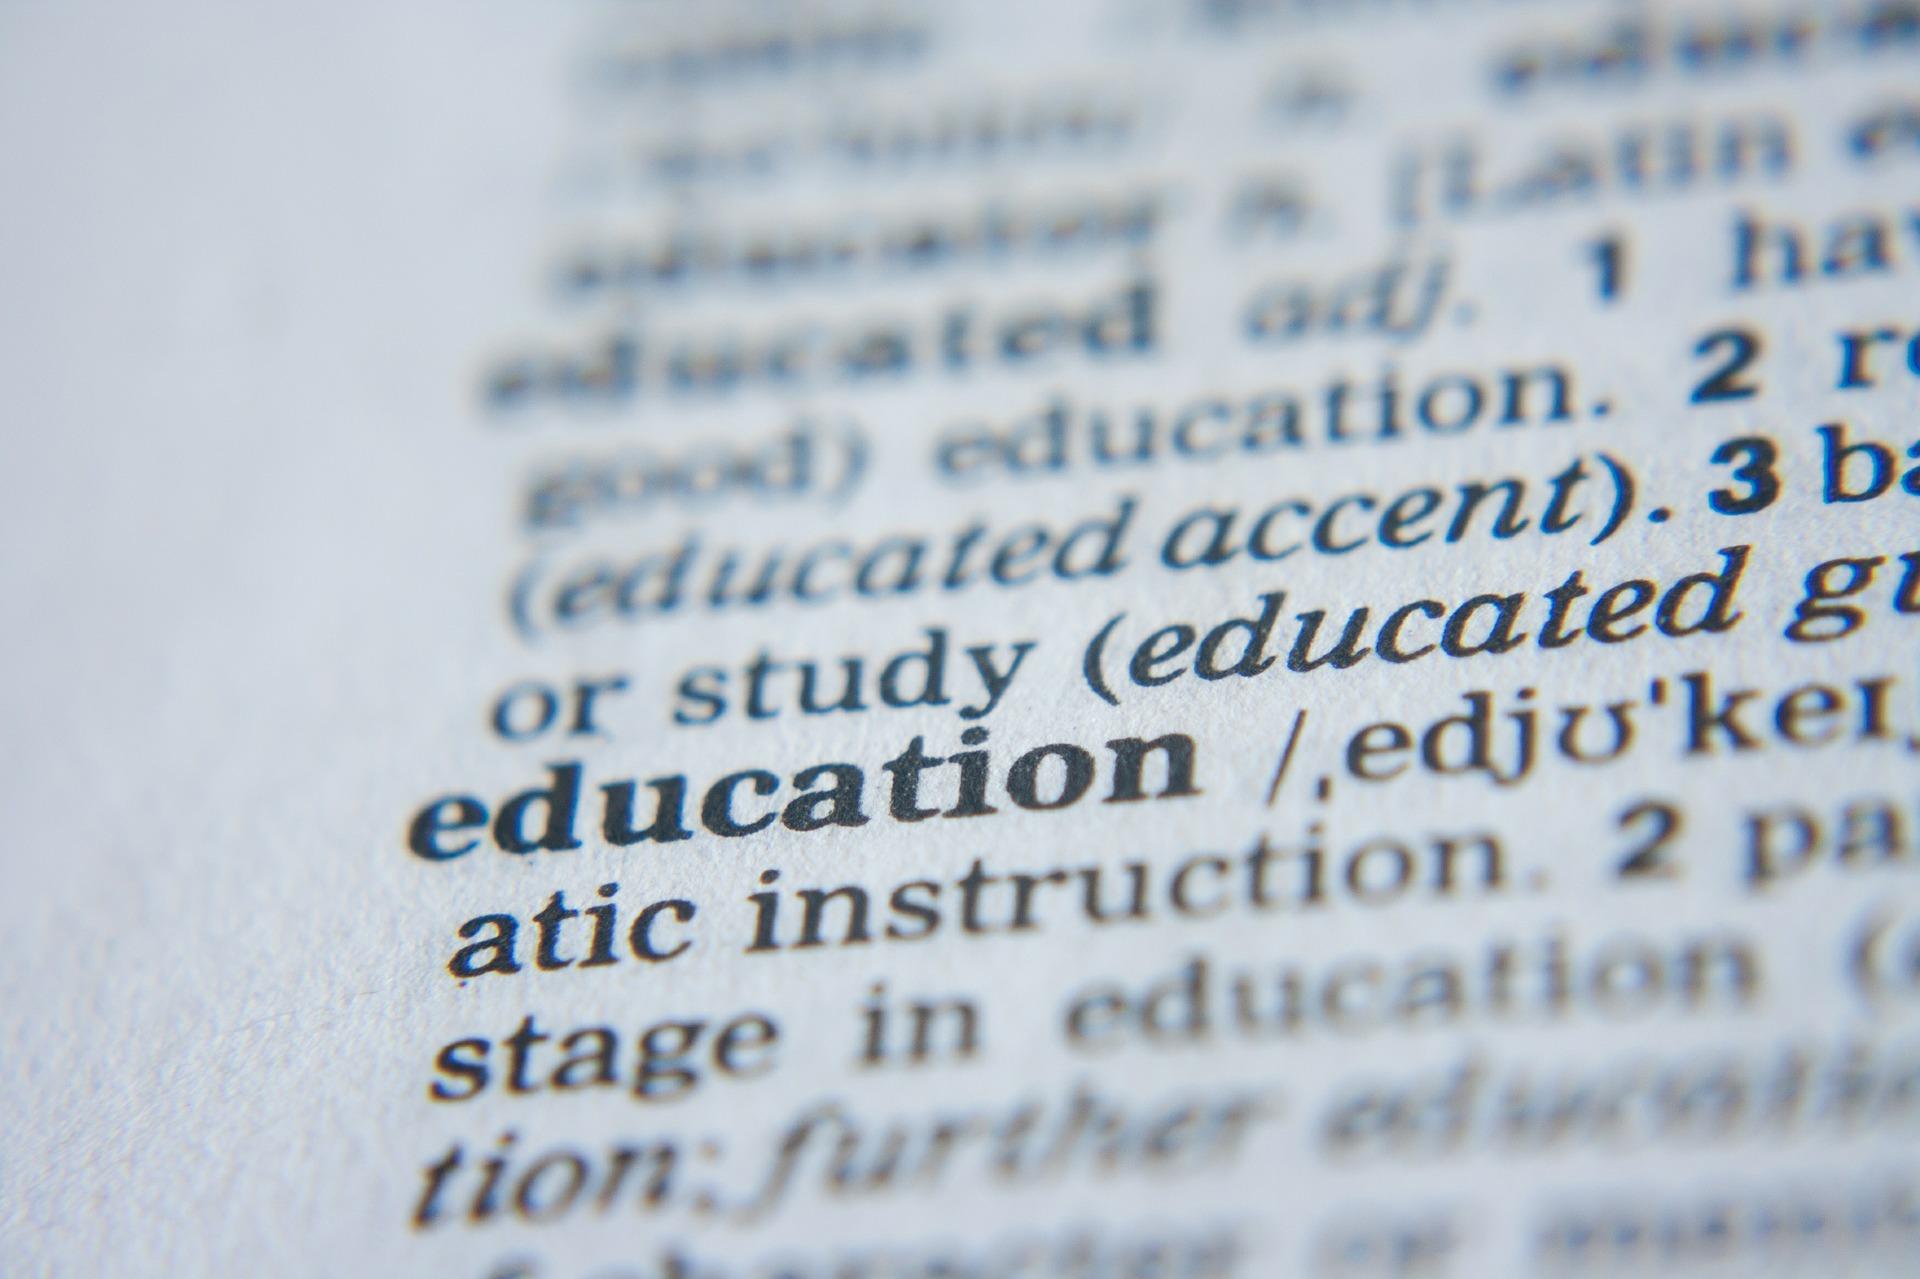 education-390764_1920